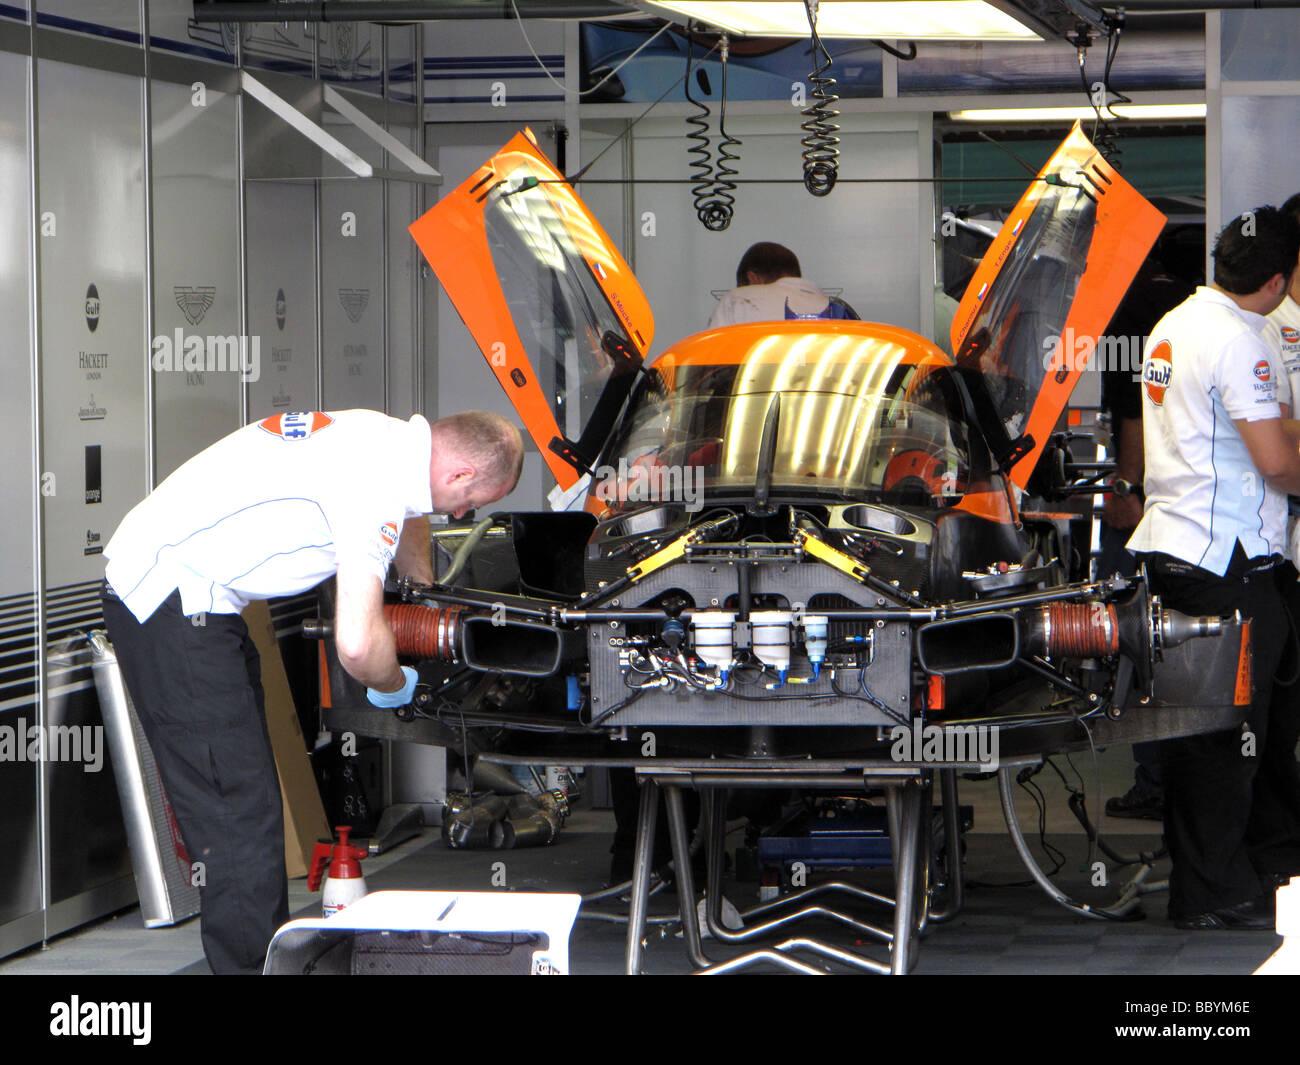 Le Mans 24 Hour Heure Motor Race Track Circuit Pit Car Mechanic Stock Photo Alamy